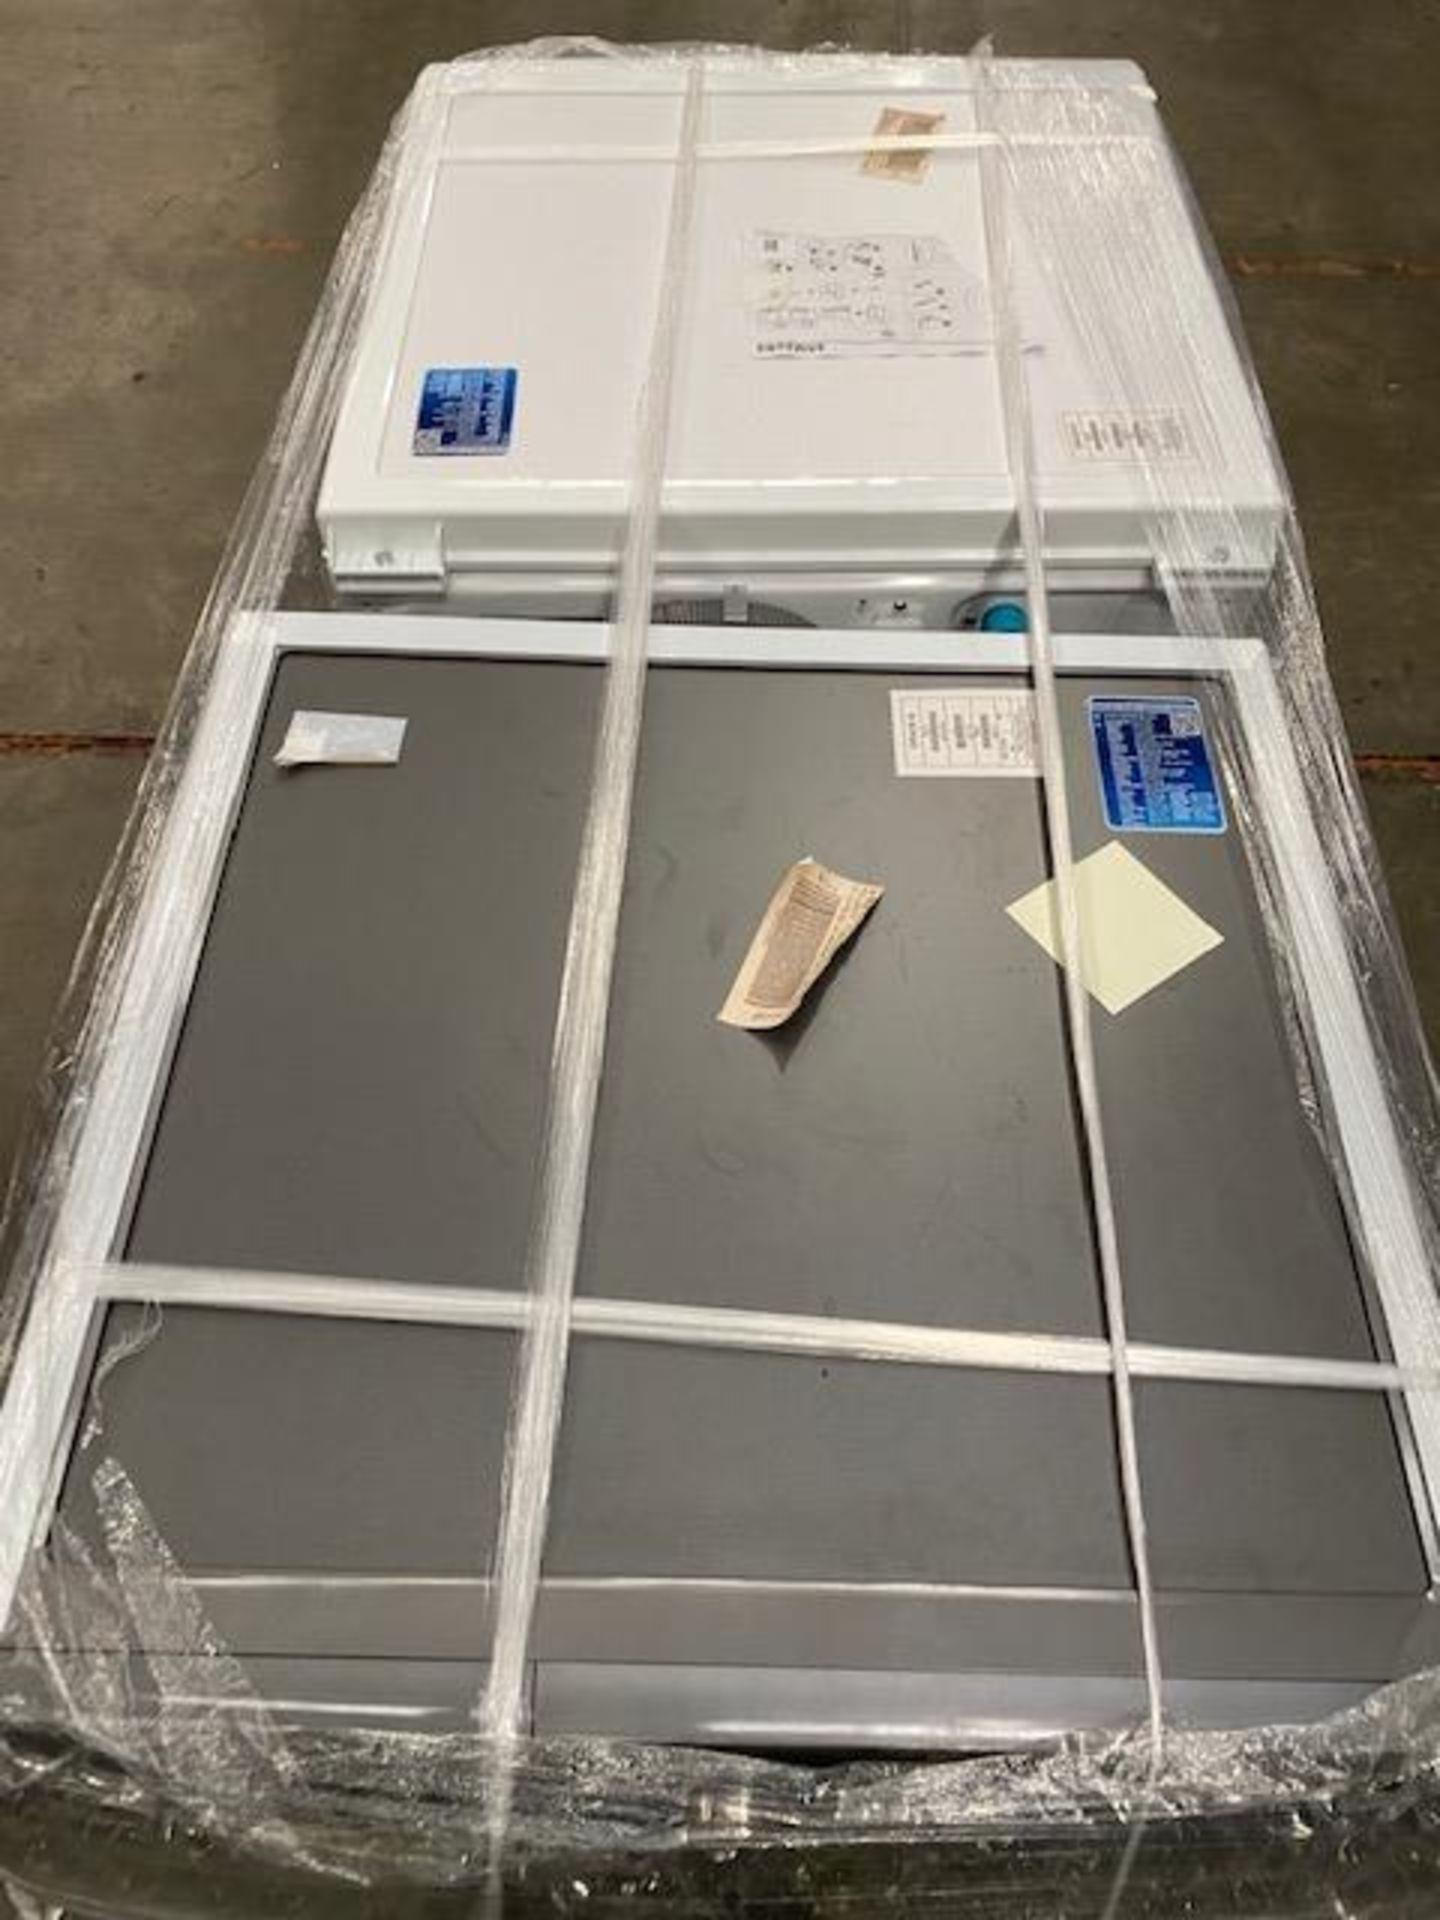 Pallet of 2 Samsung Premium Washing machines. Total Latest selling price £1,219.97* - Image 4 of 8